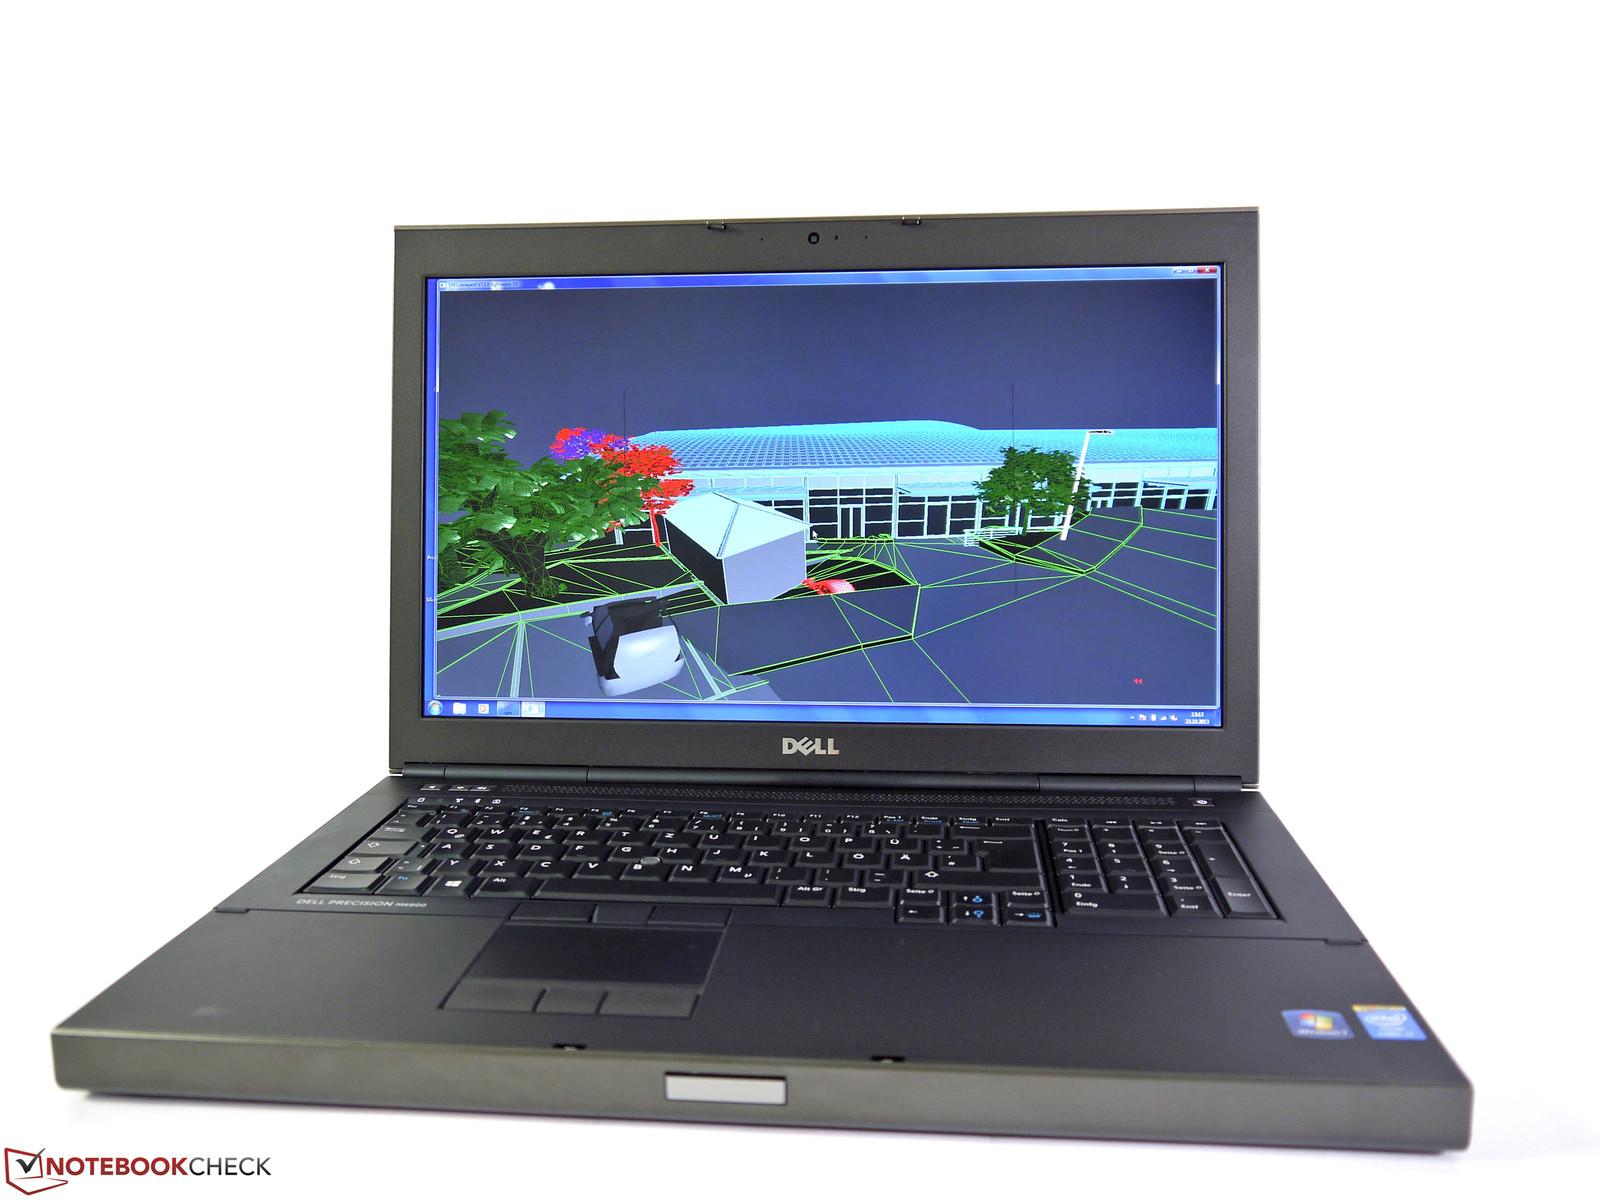 Refurbished Dell Precision Mobile Workstation M6800 - 17 3